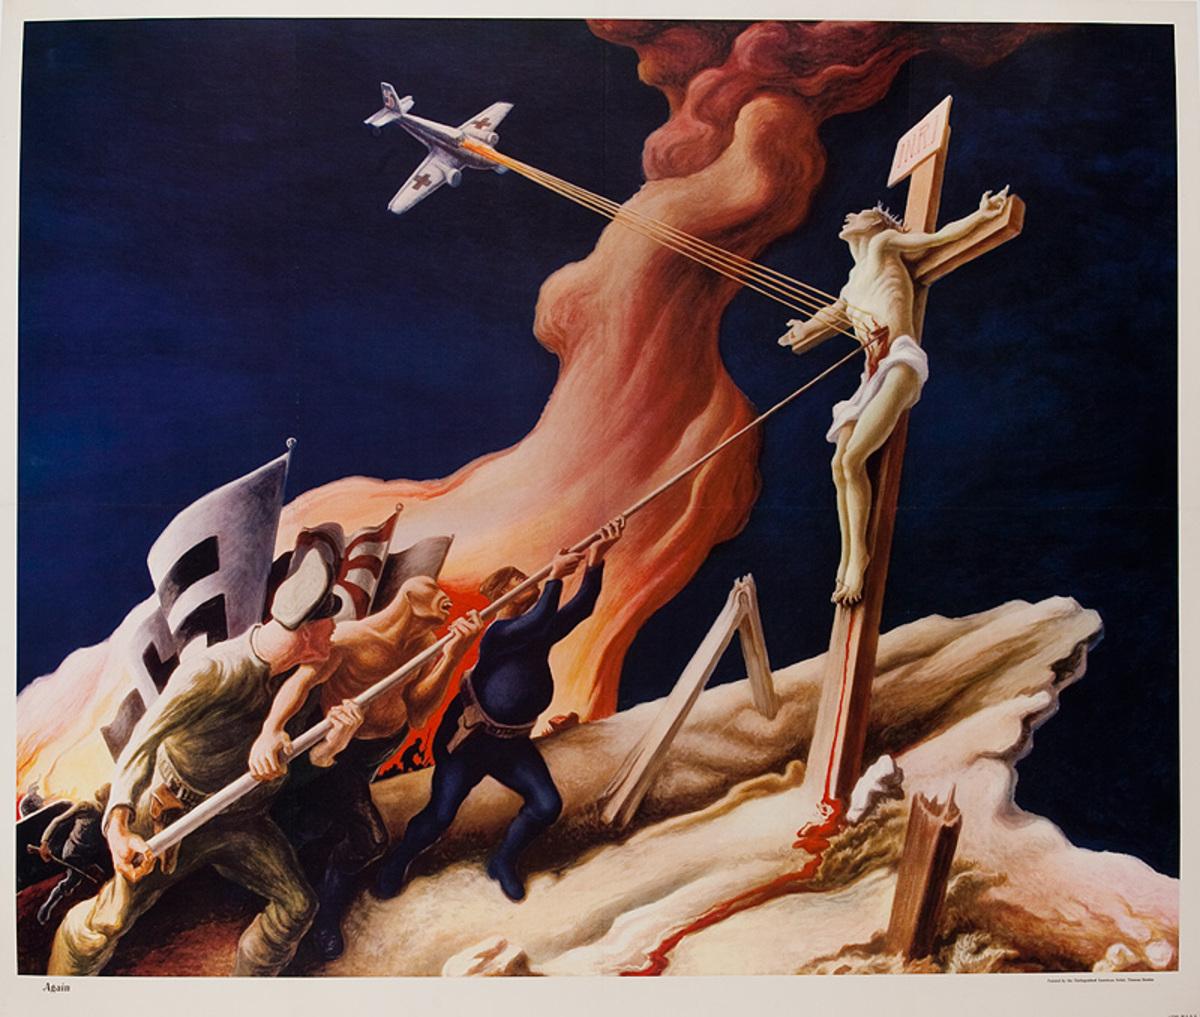 Again, Original Thomas Hart Benton WWII Poster